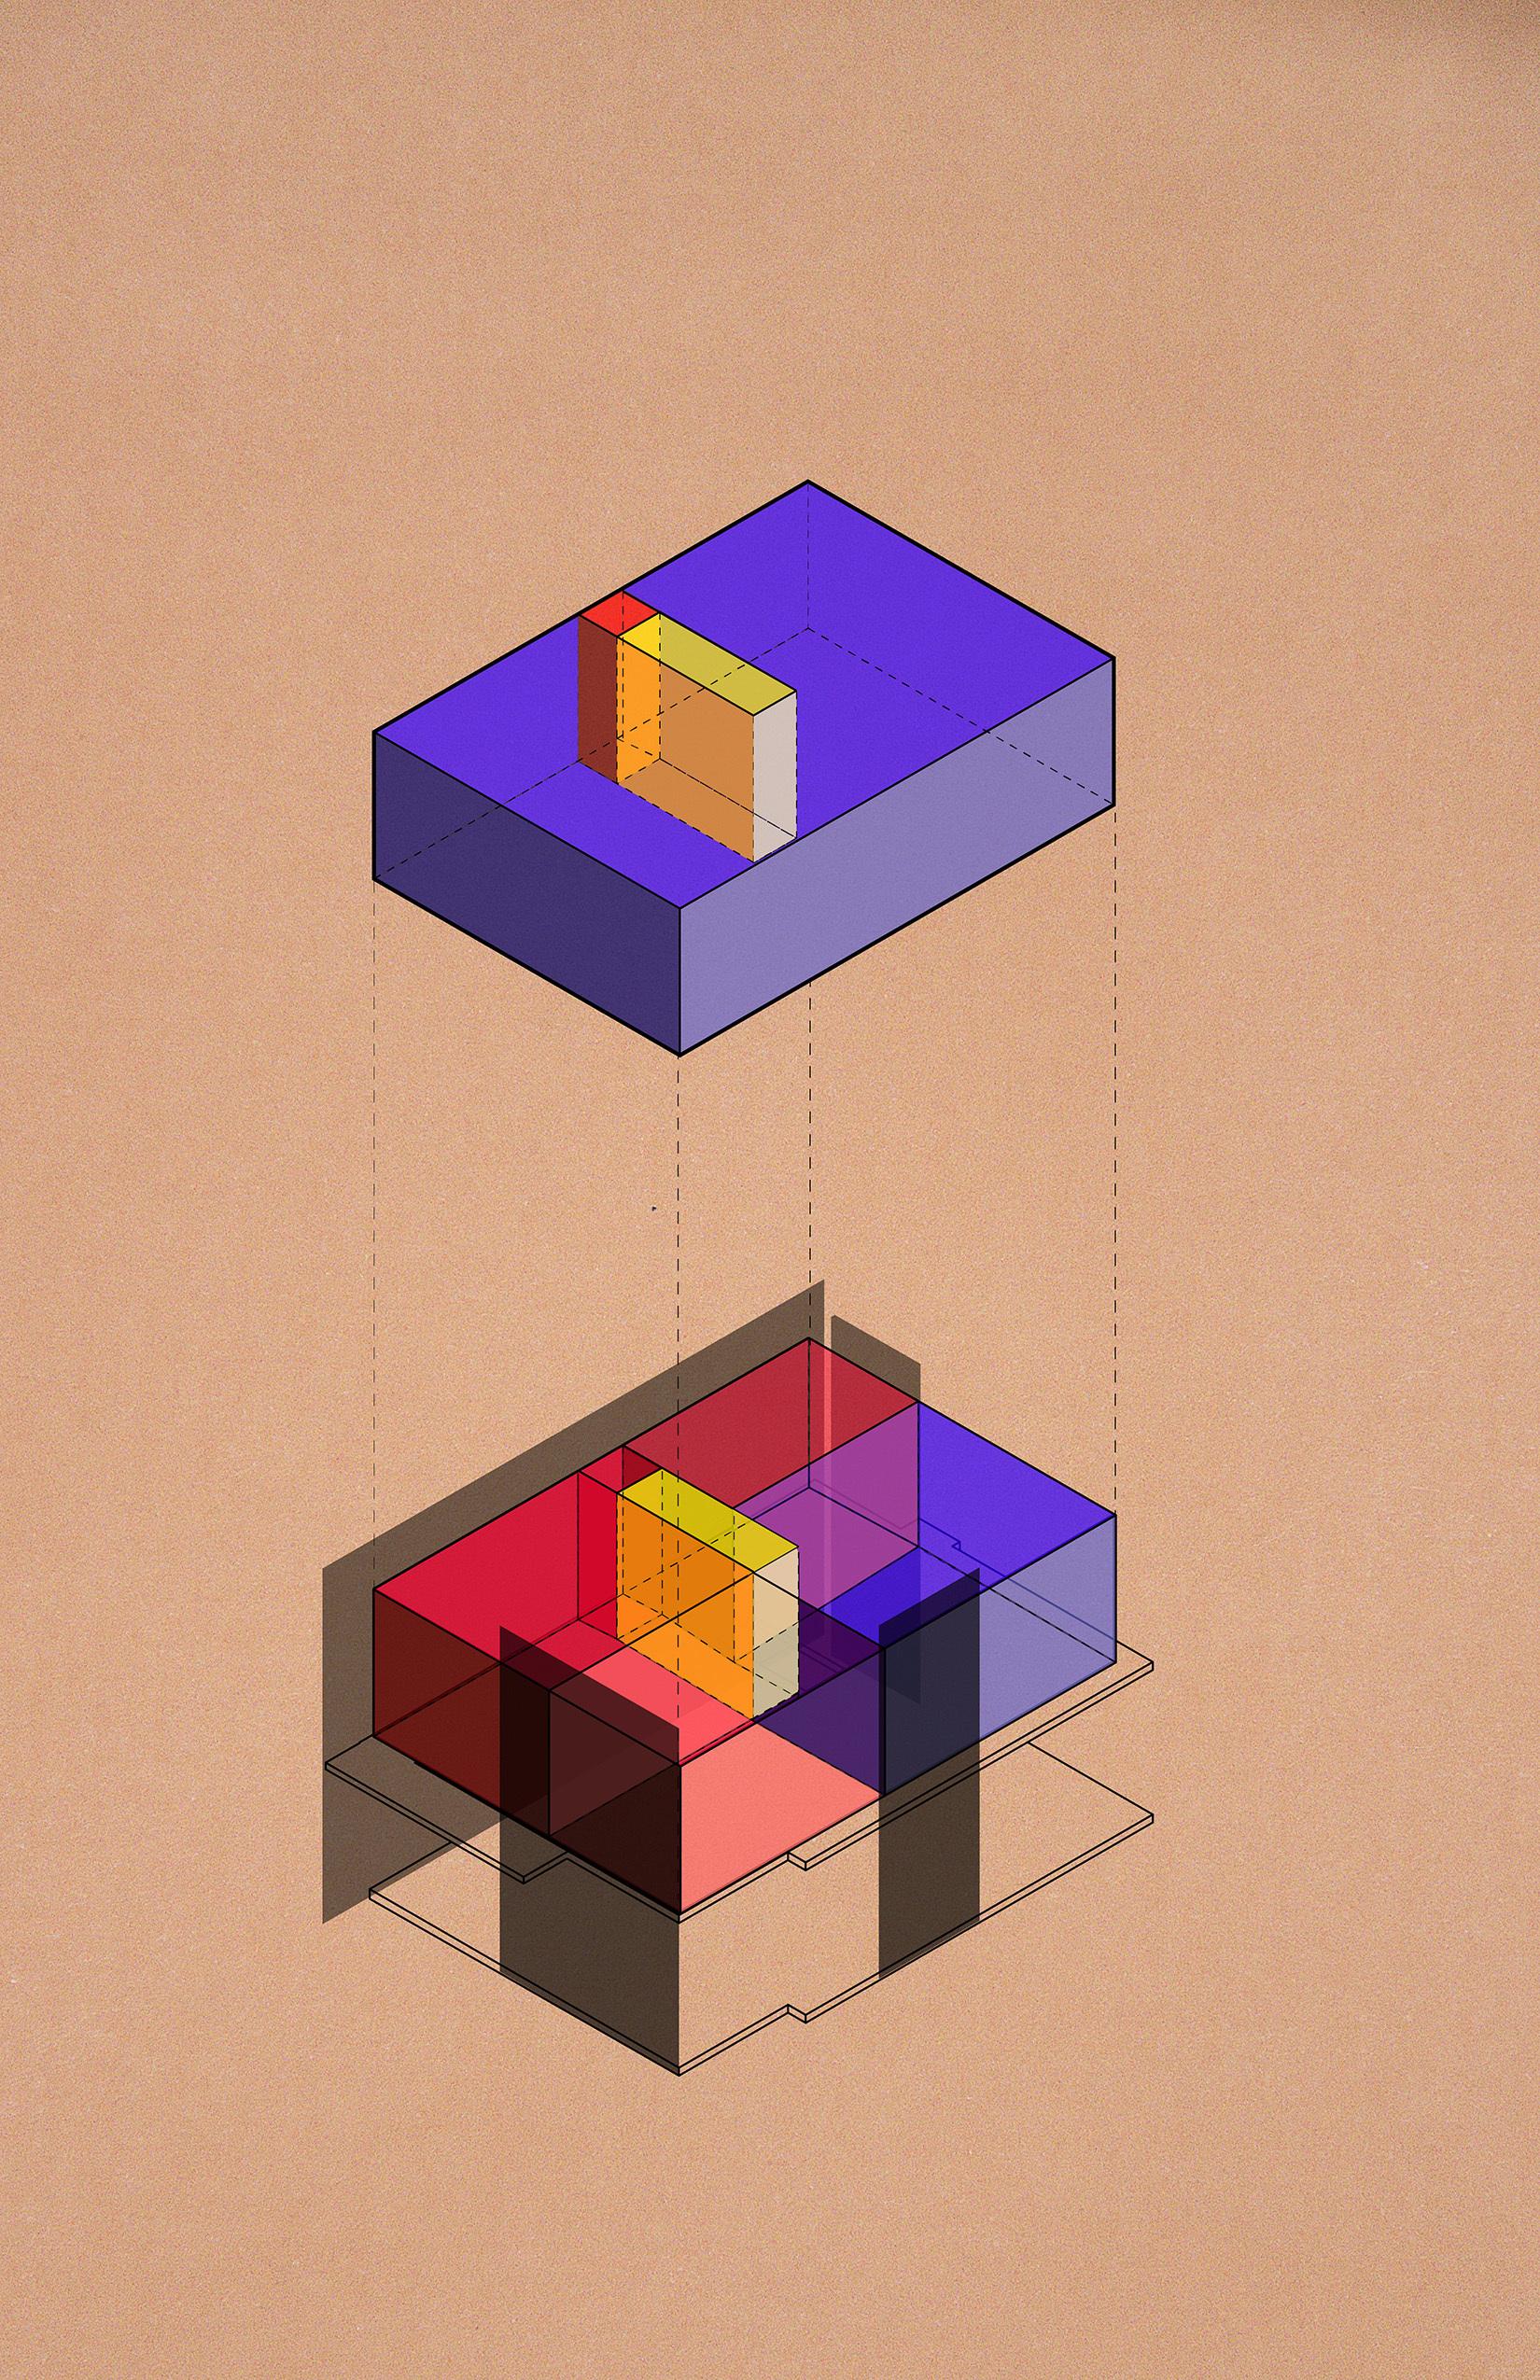 house diagram - Gidiye.redformapolitica.co